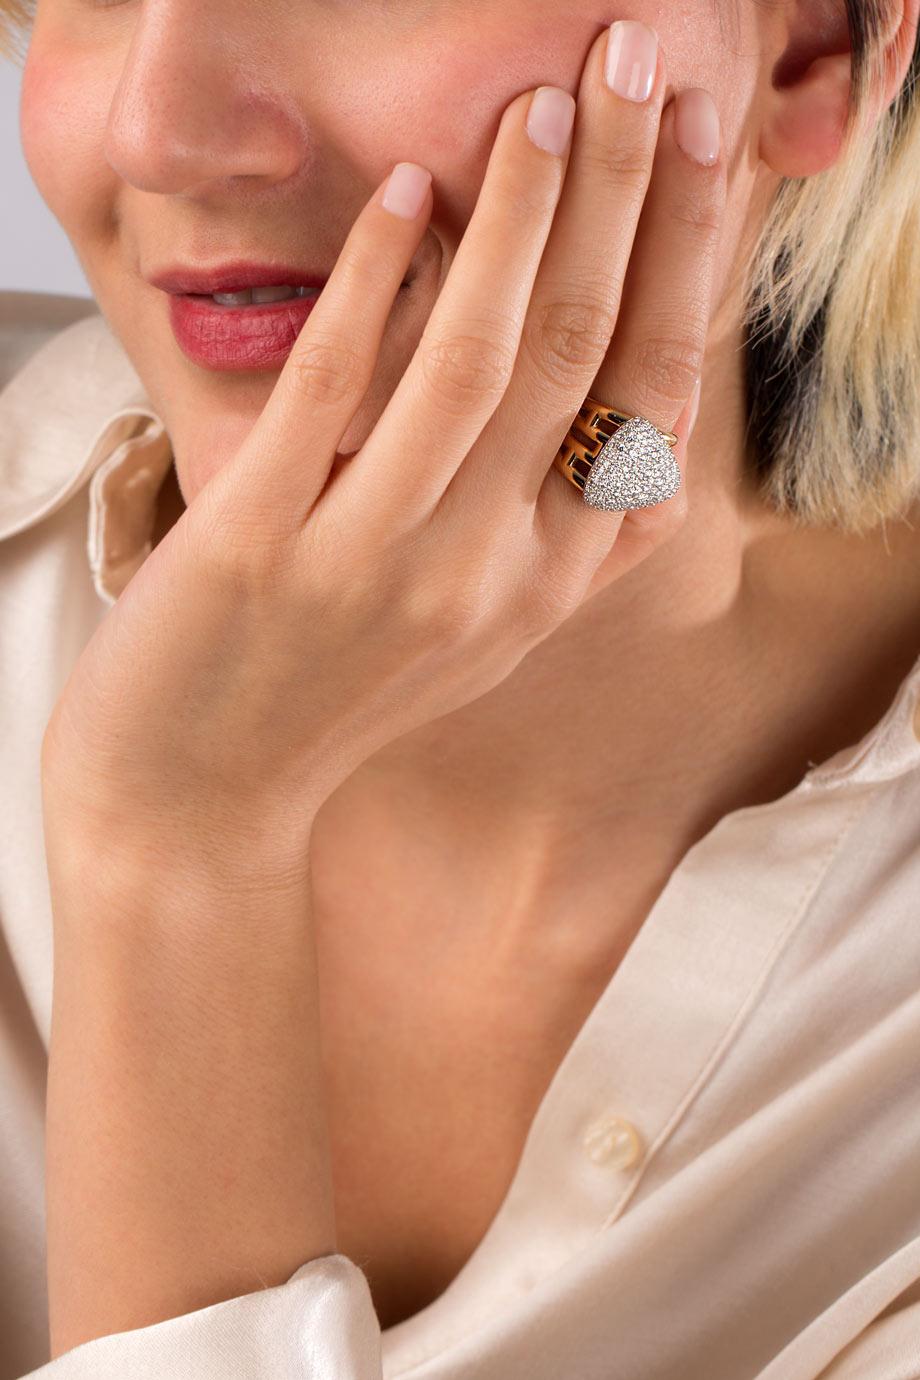 انگشتر طلا مثلث بزرگ با برلیان